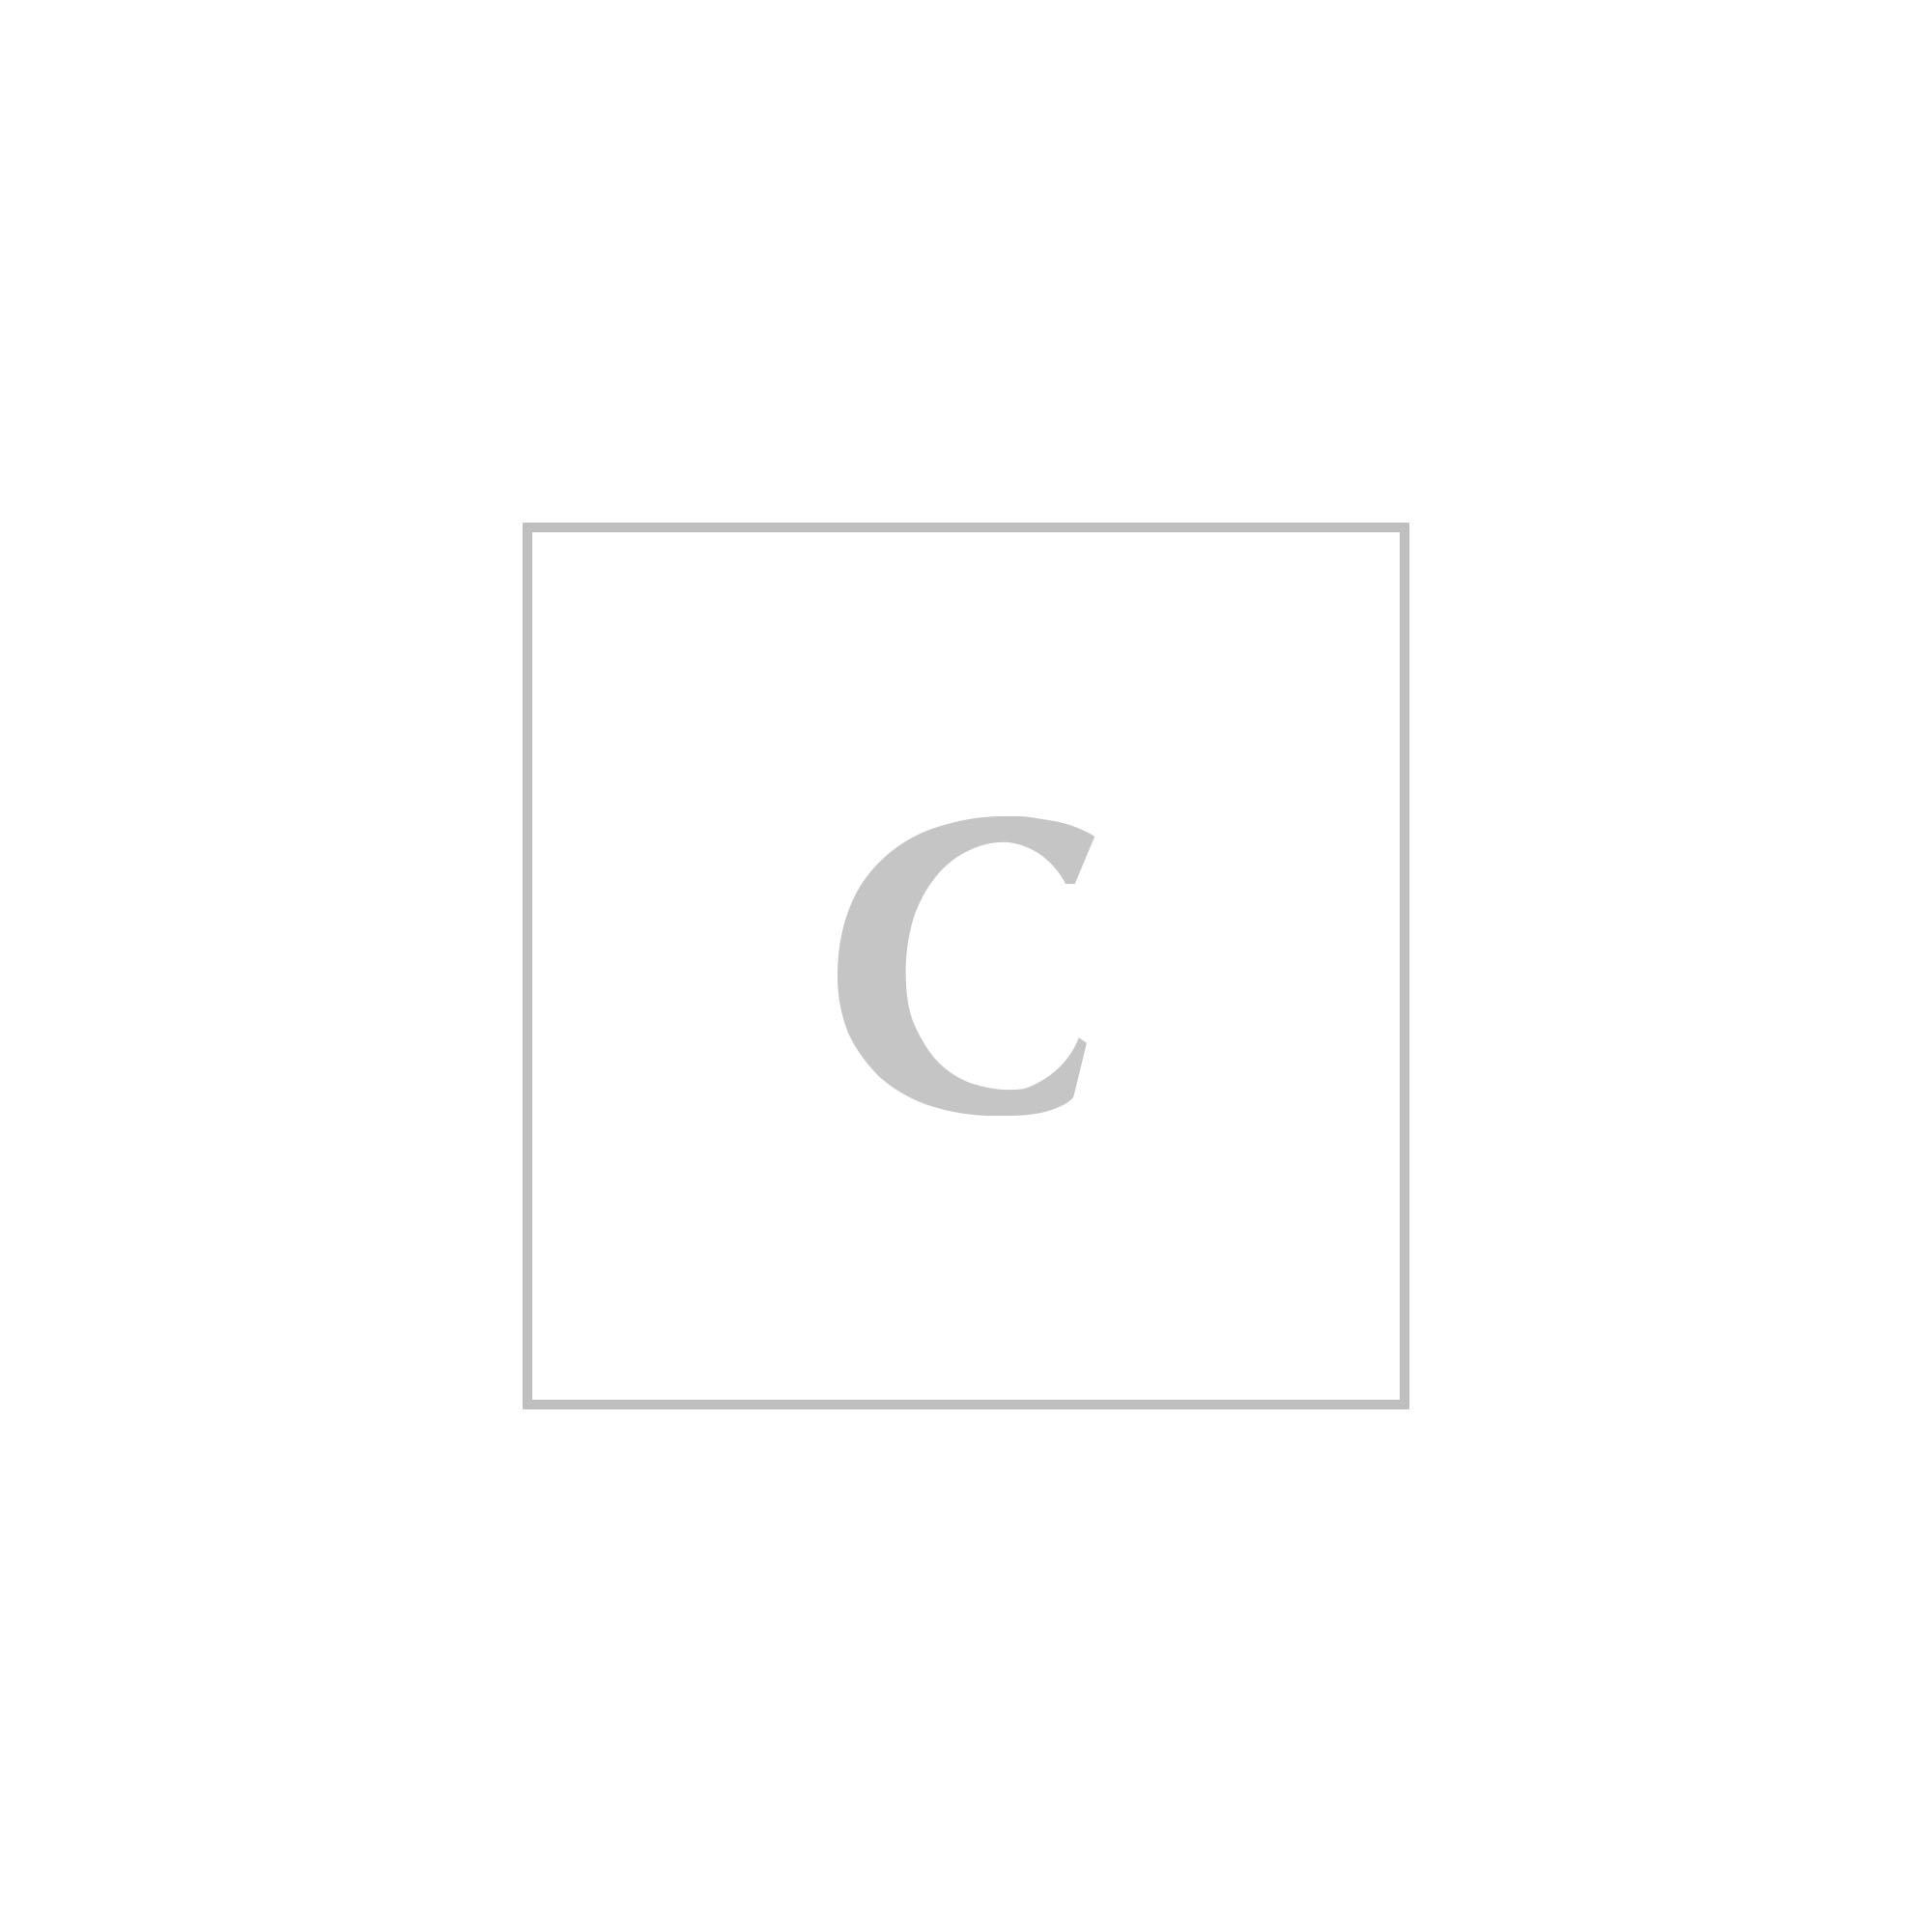 Salvatore ferragamo scarpa 3e nabucco 028210 004 mvit venice sp.1,4